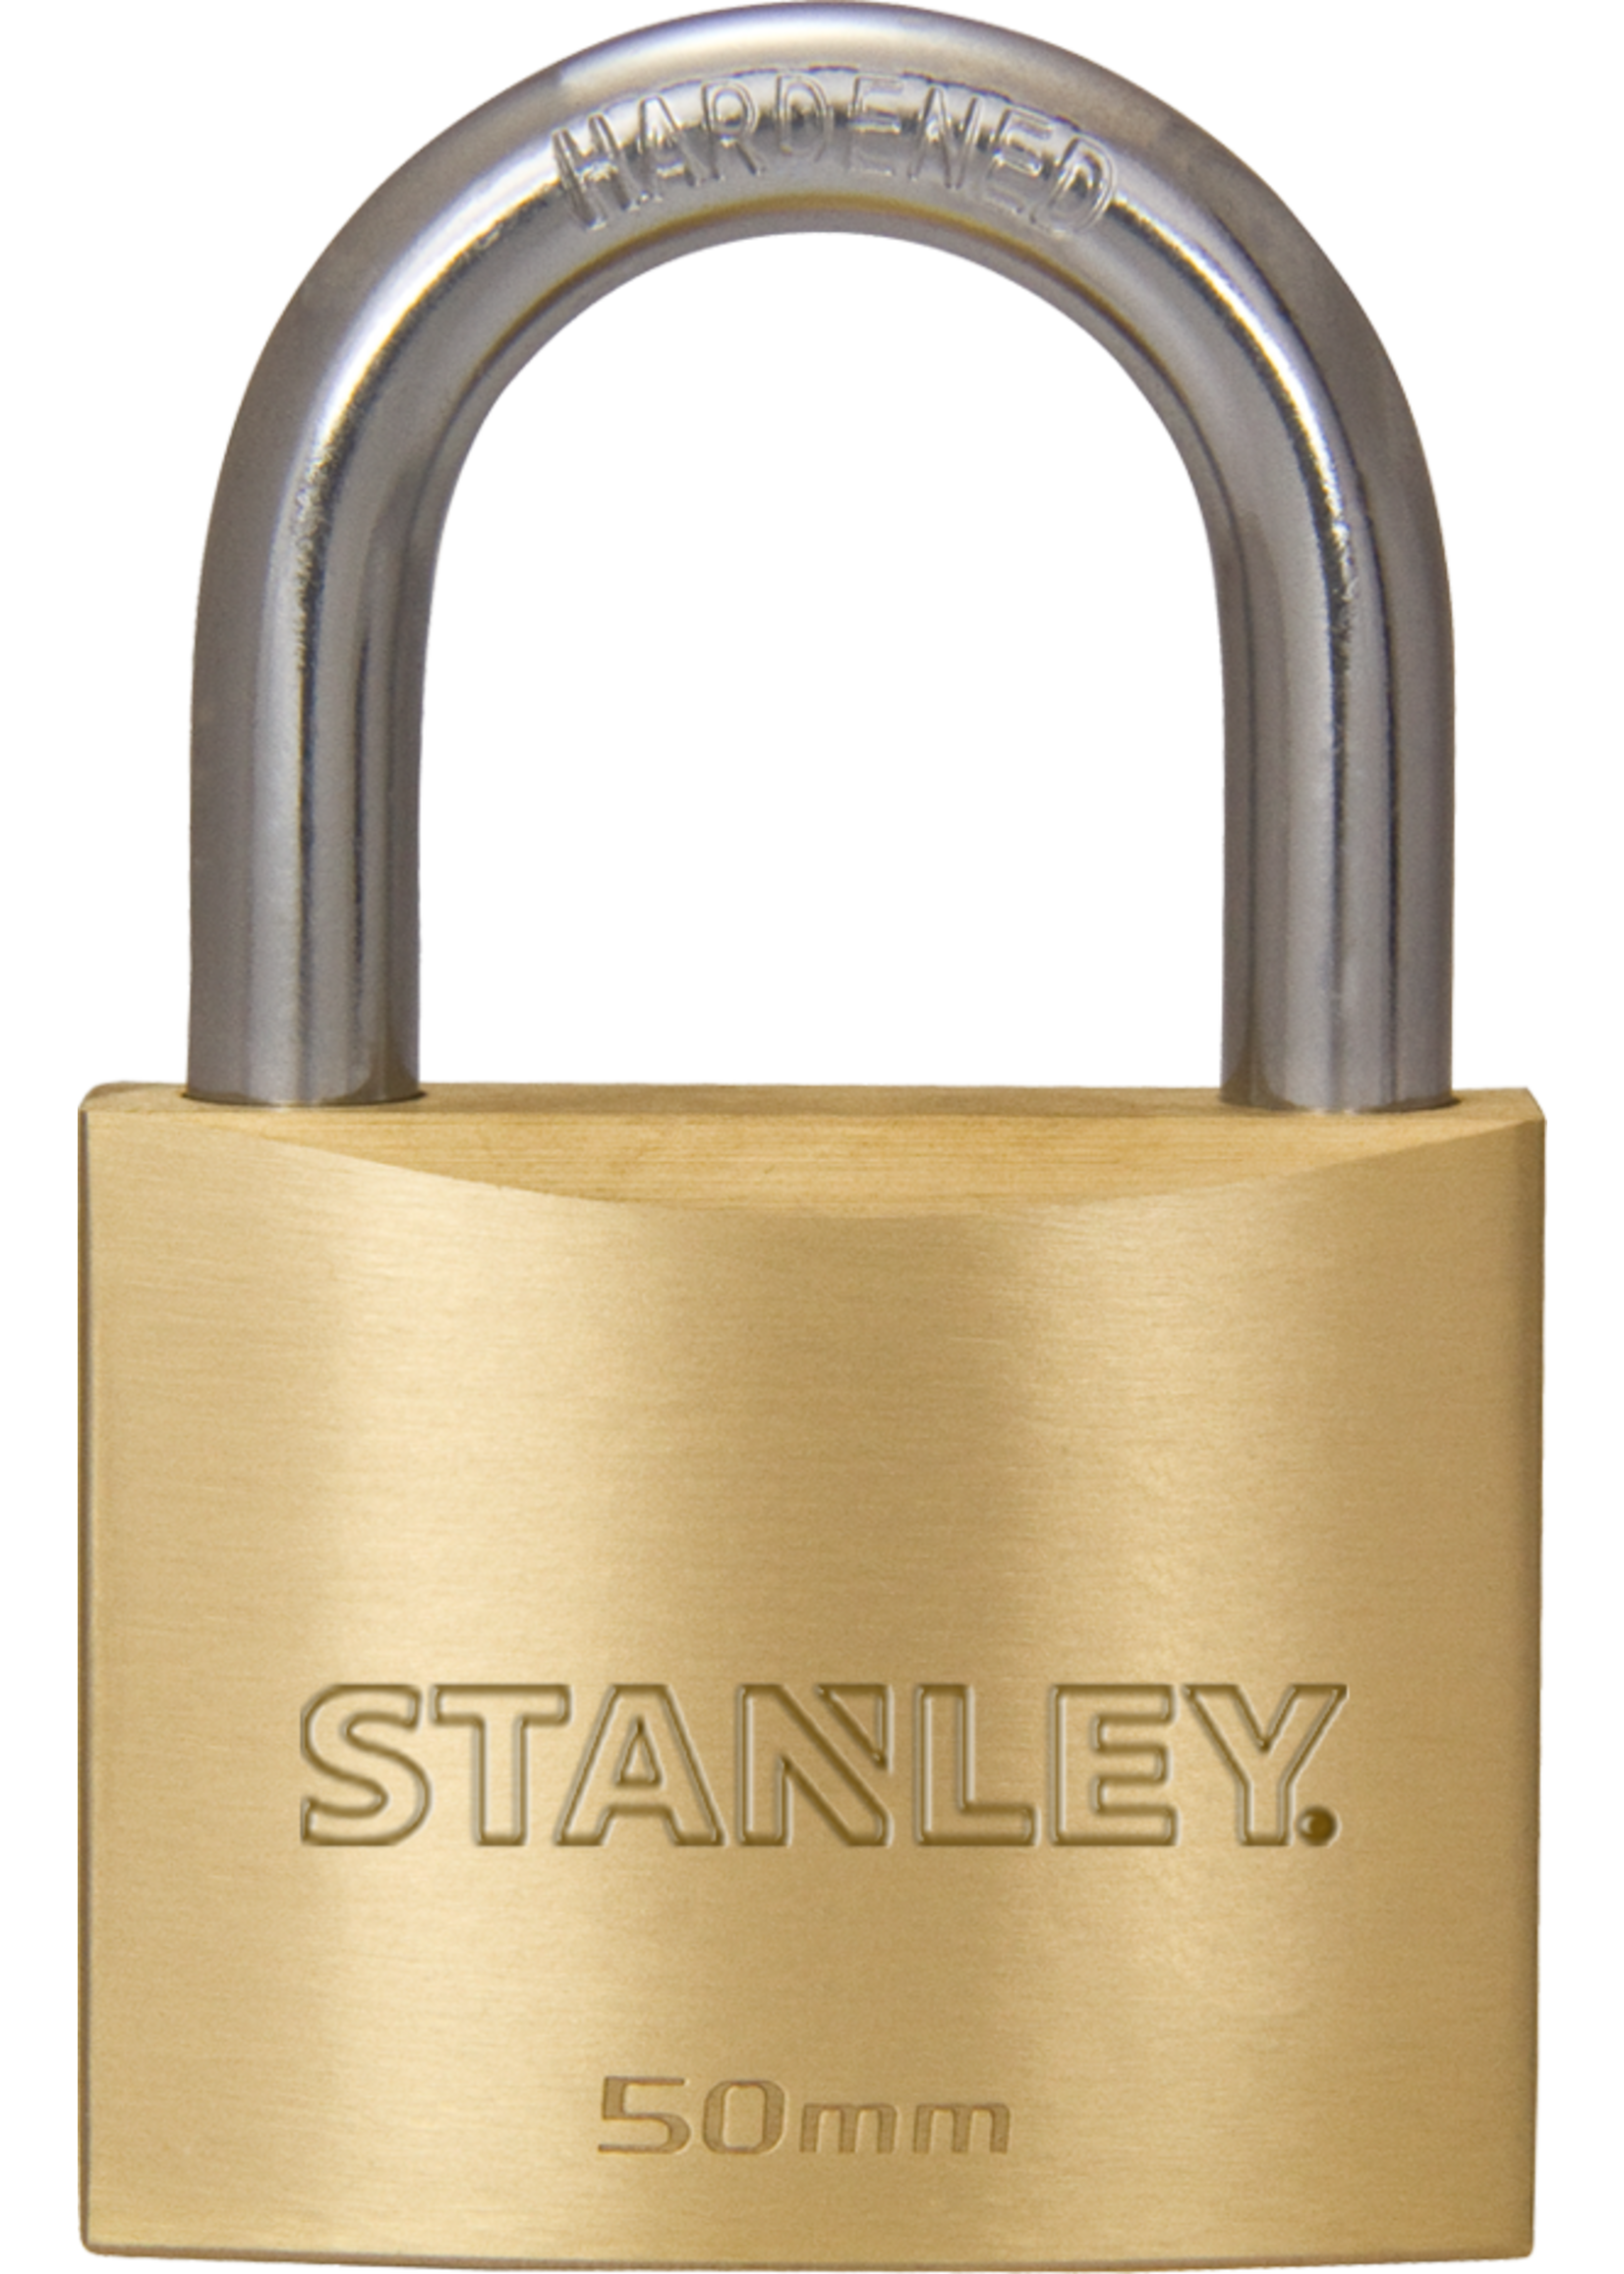 Stanley 4 stuks Stanley hangslot massief messing 50 mm standaard beugel